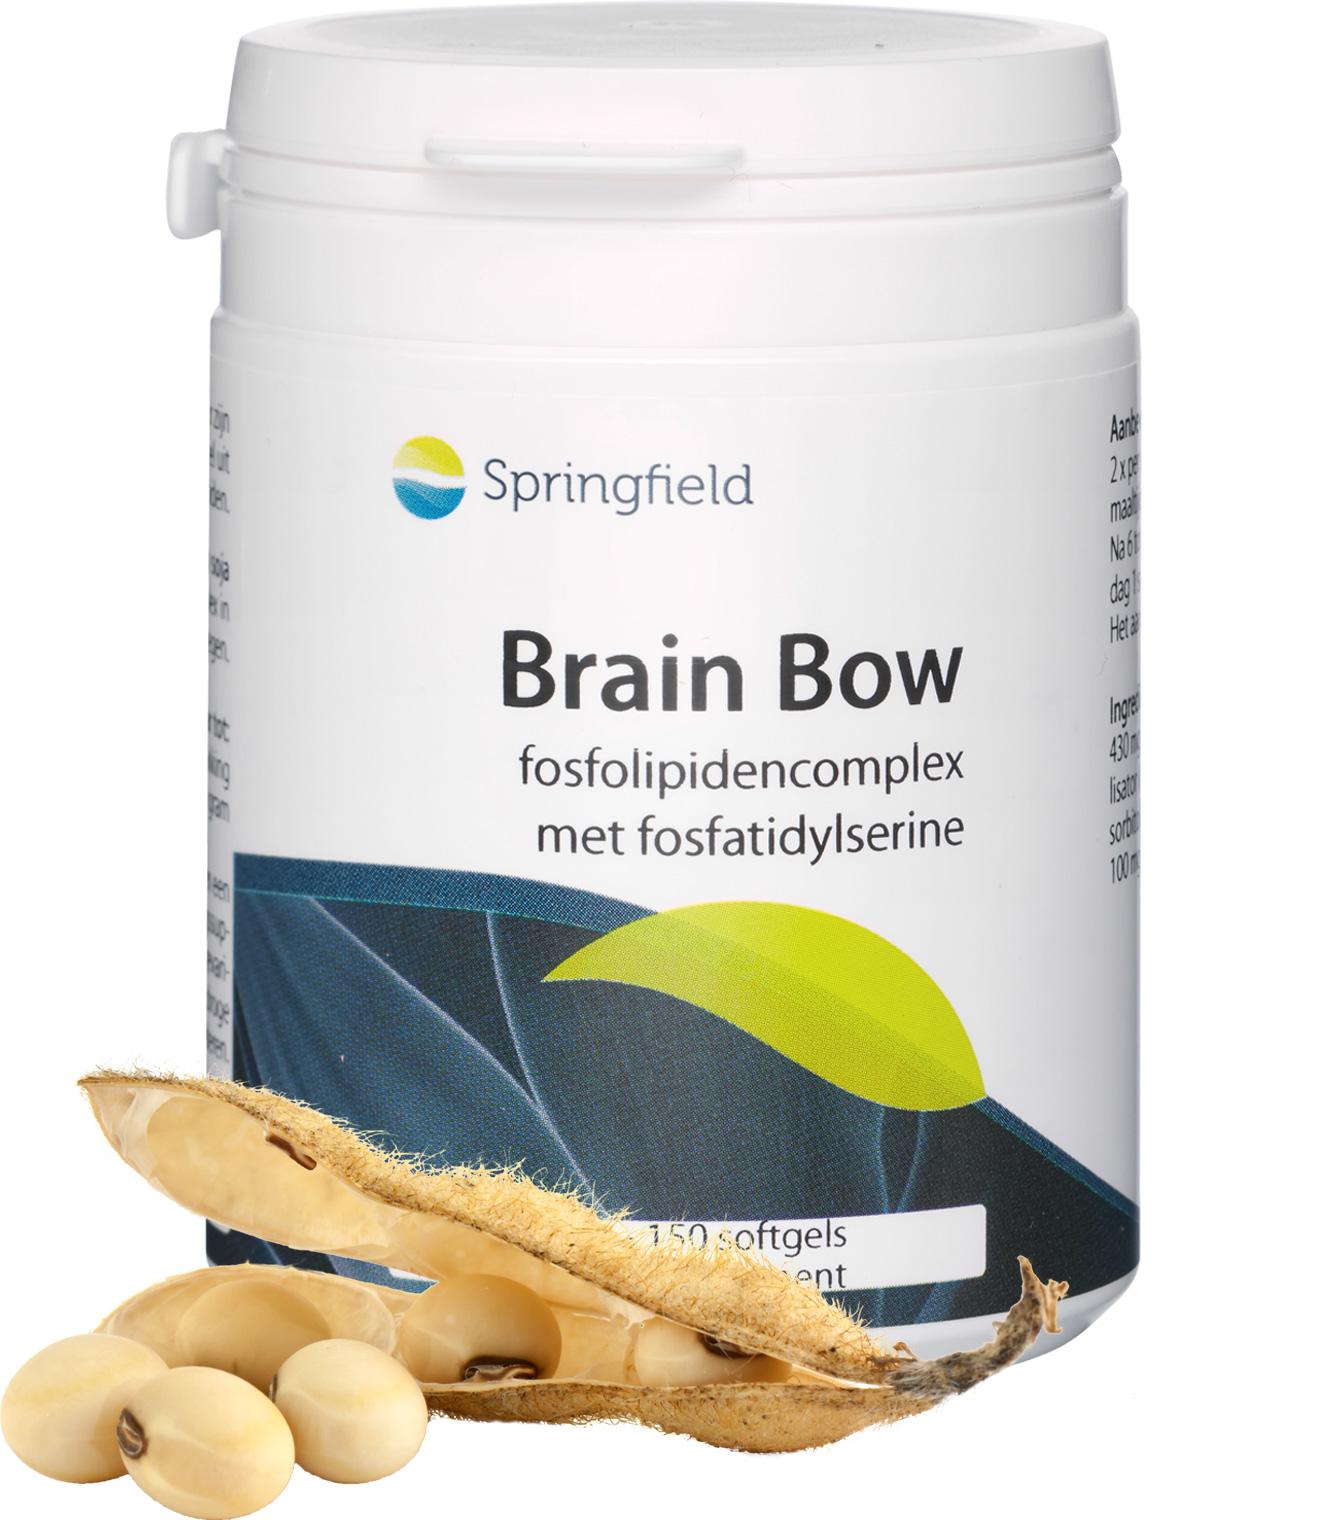 Brain Bow fosfatidylserine, fosfatidezuur en andere fosfolipiden 150 softgels